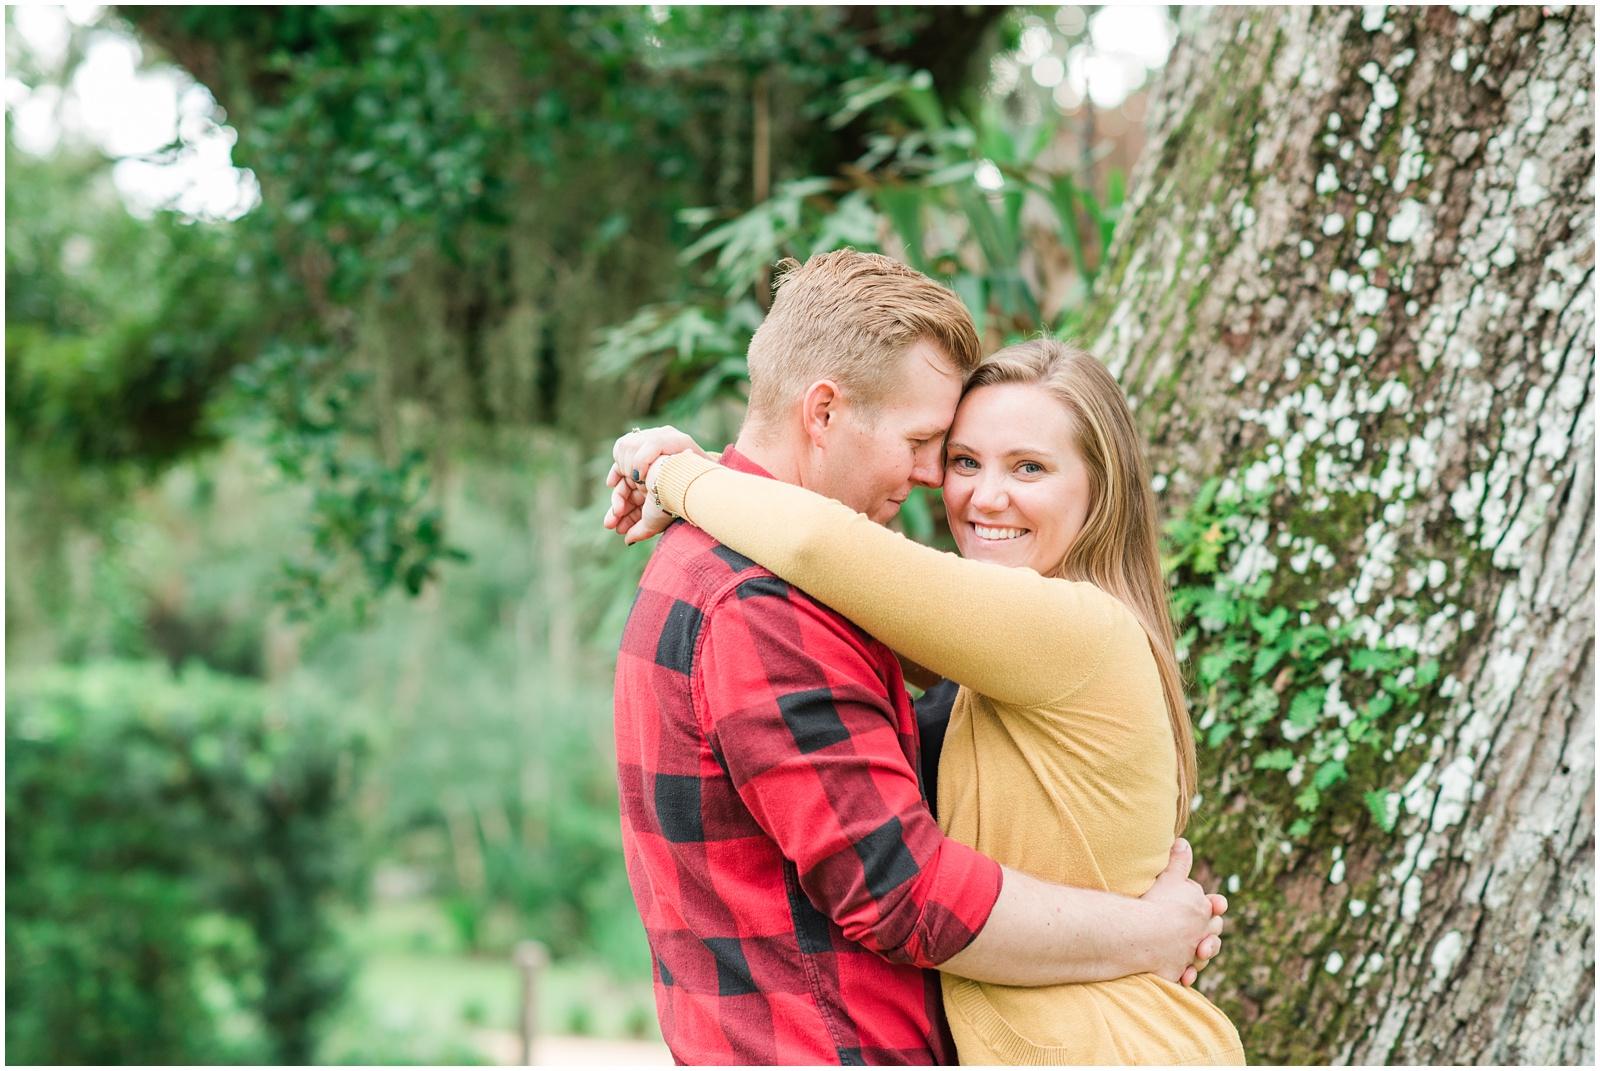 Palm Coast_Washington Oaks Garden_State Park_Engagement_Portraits_27.jpg